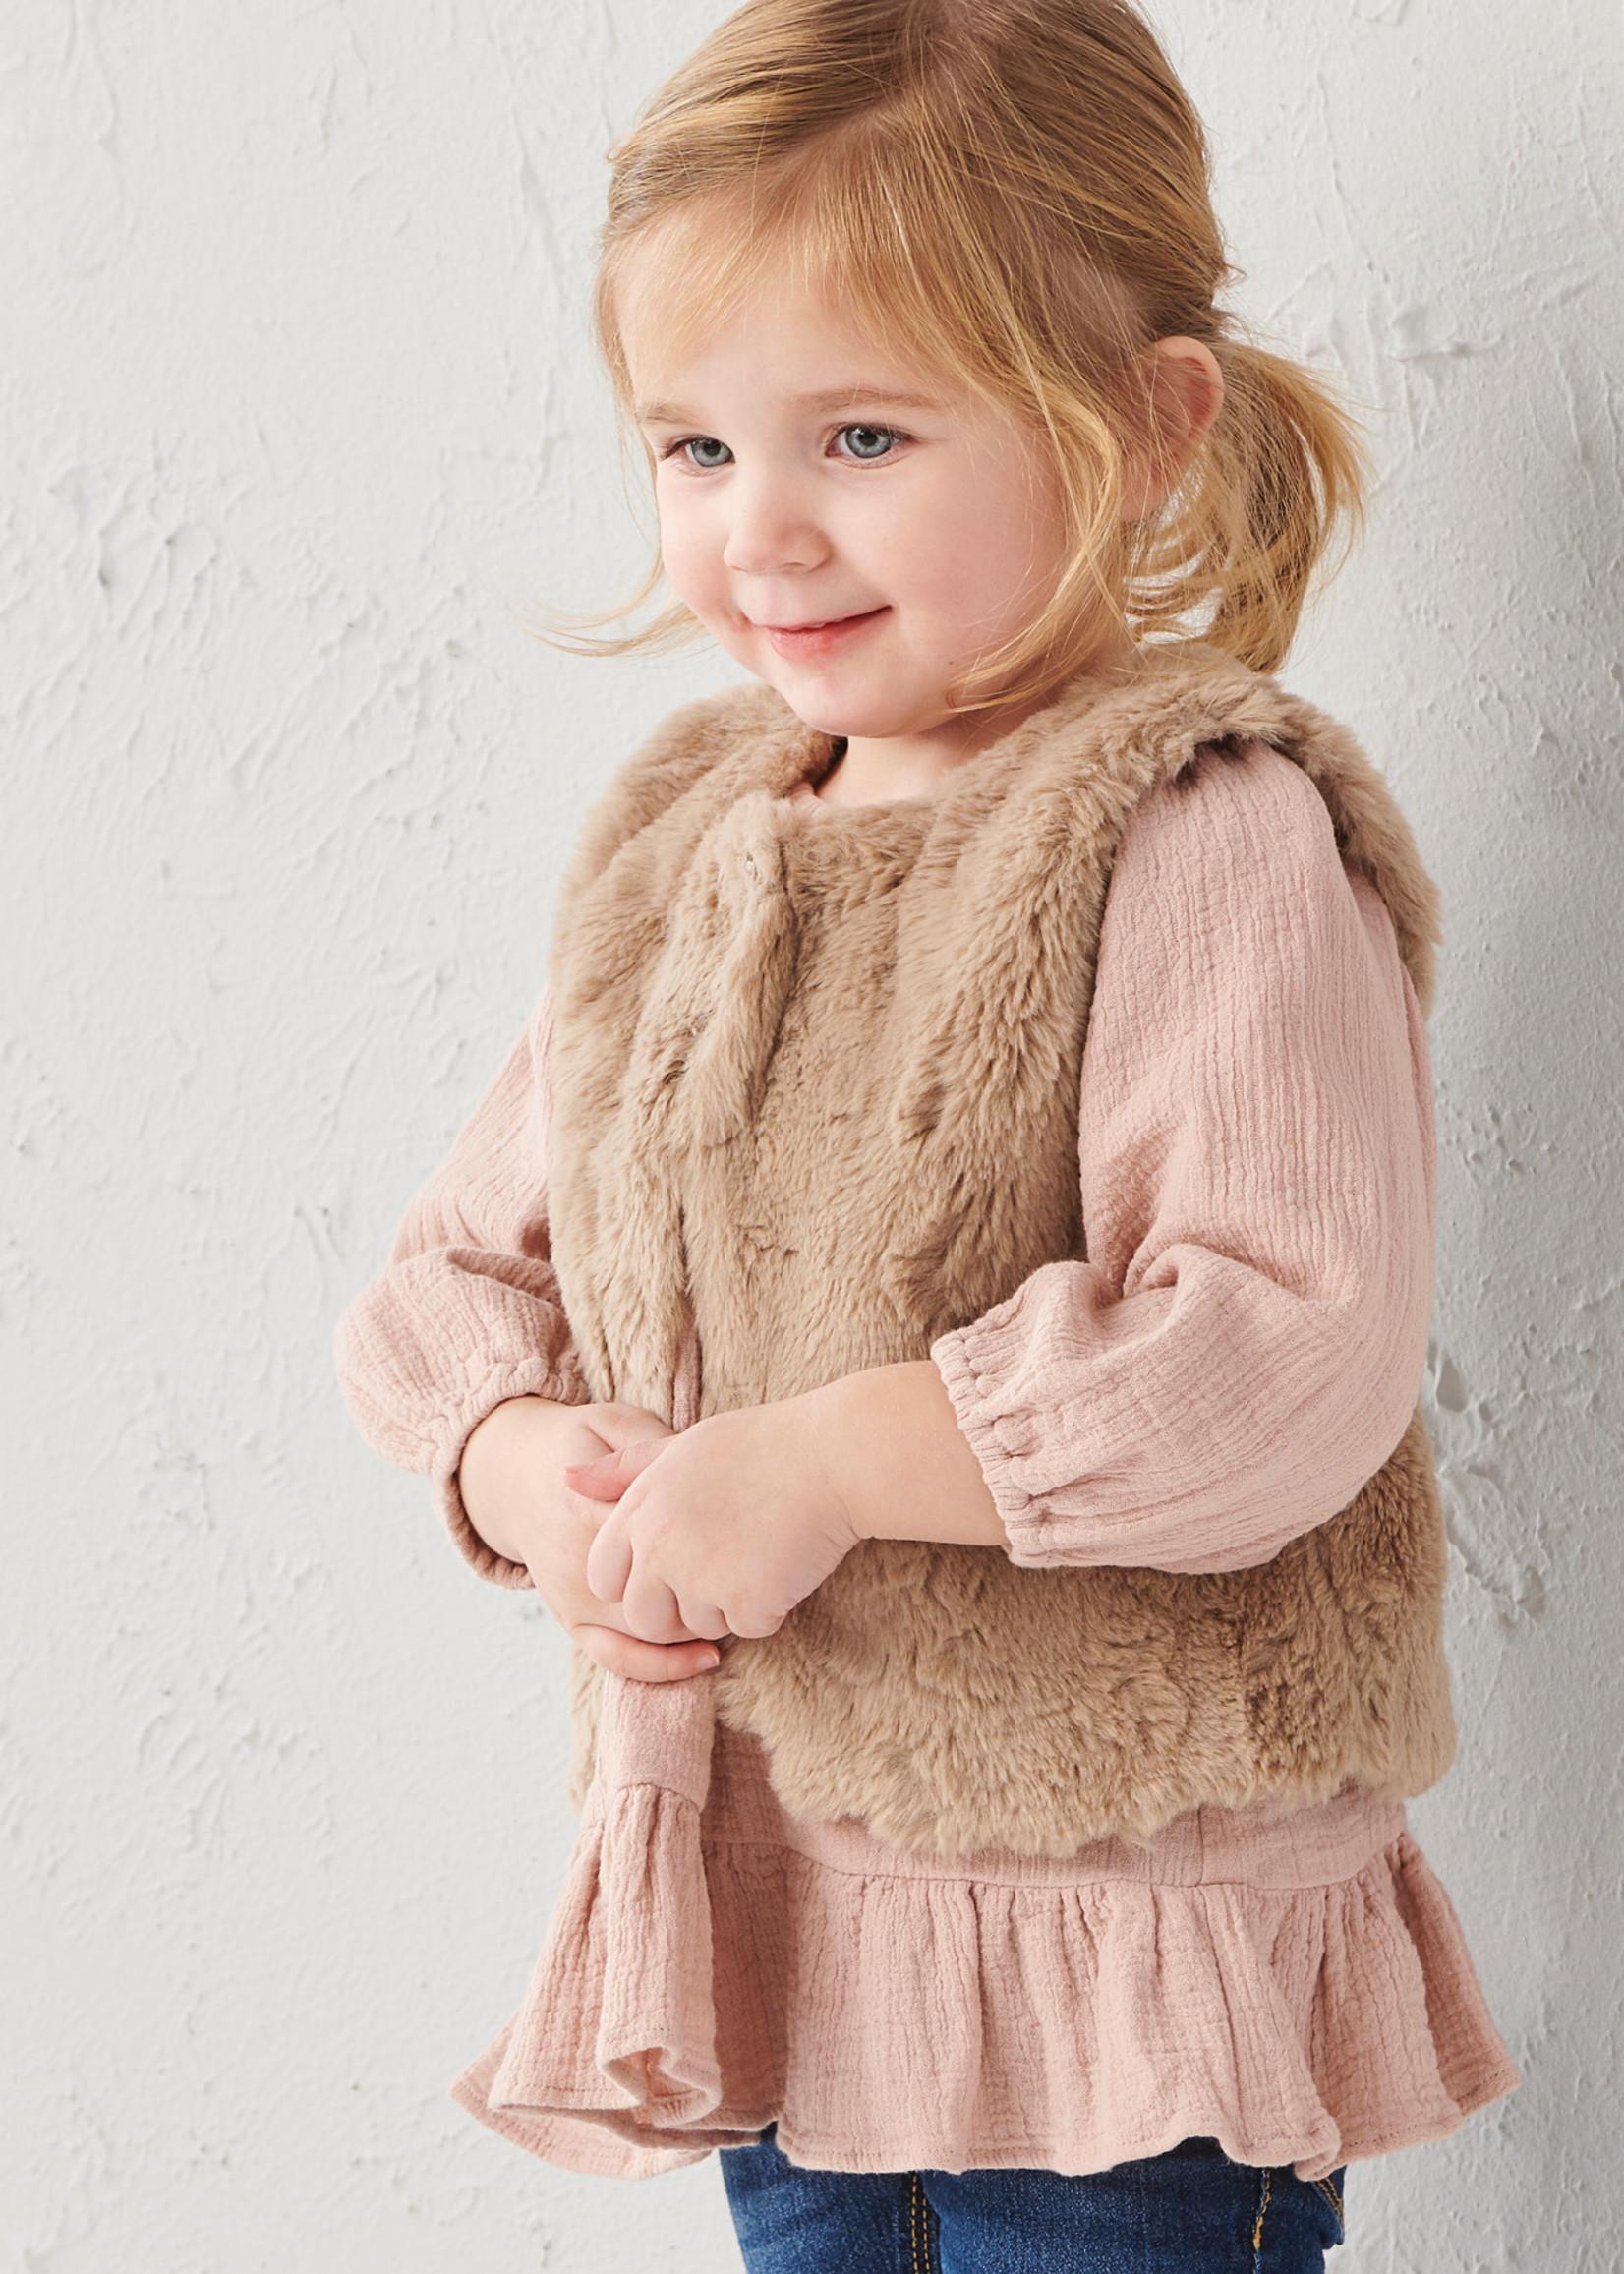 Cartwheels Cartwheels - Fur Vest (3 colors)